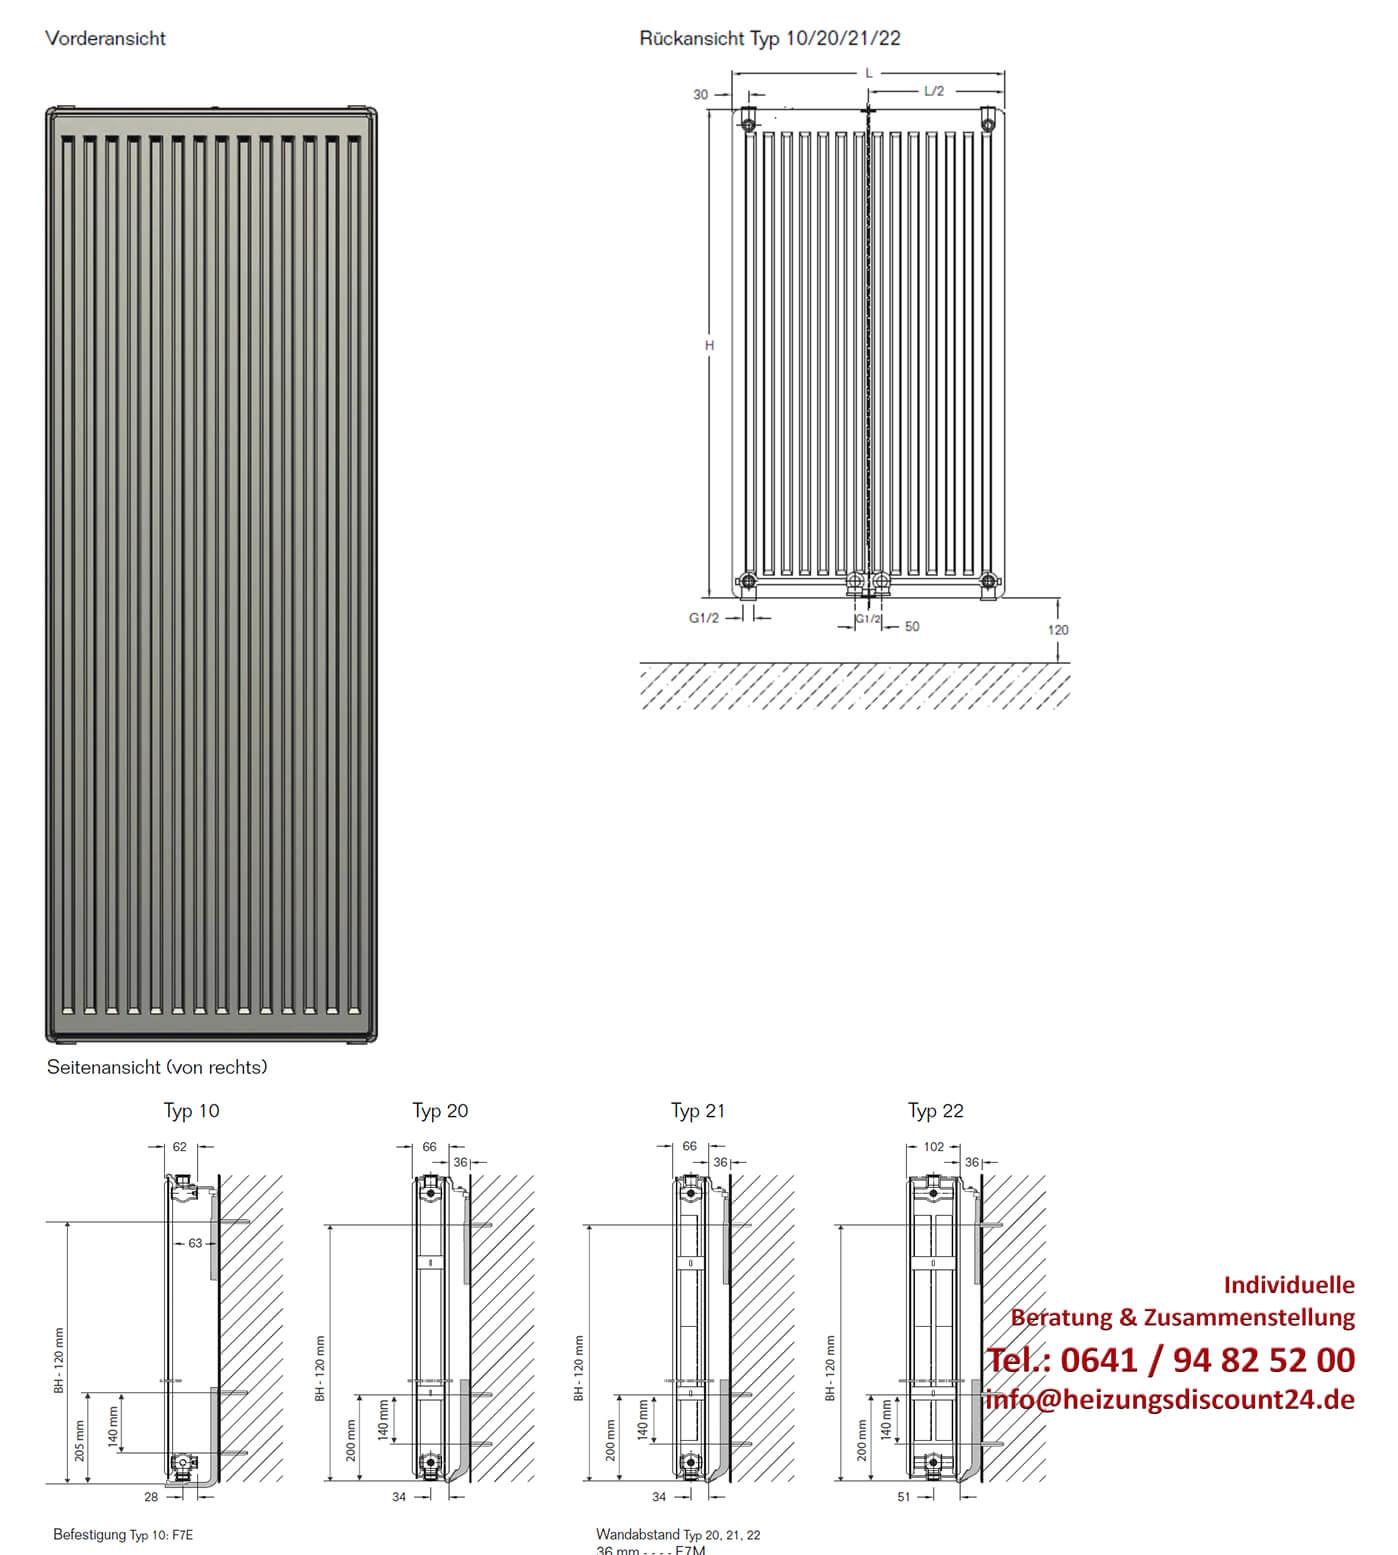 buderus heizkörper vertikal-kompakt cv-profil typ 10 1600x700 mm (h